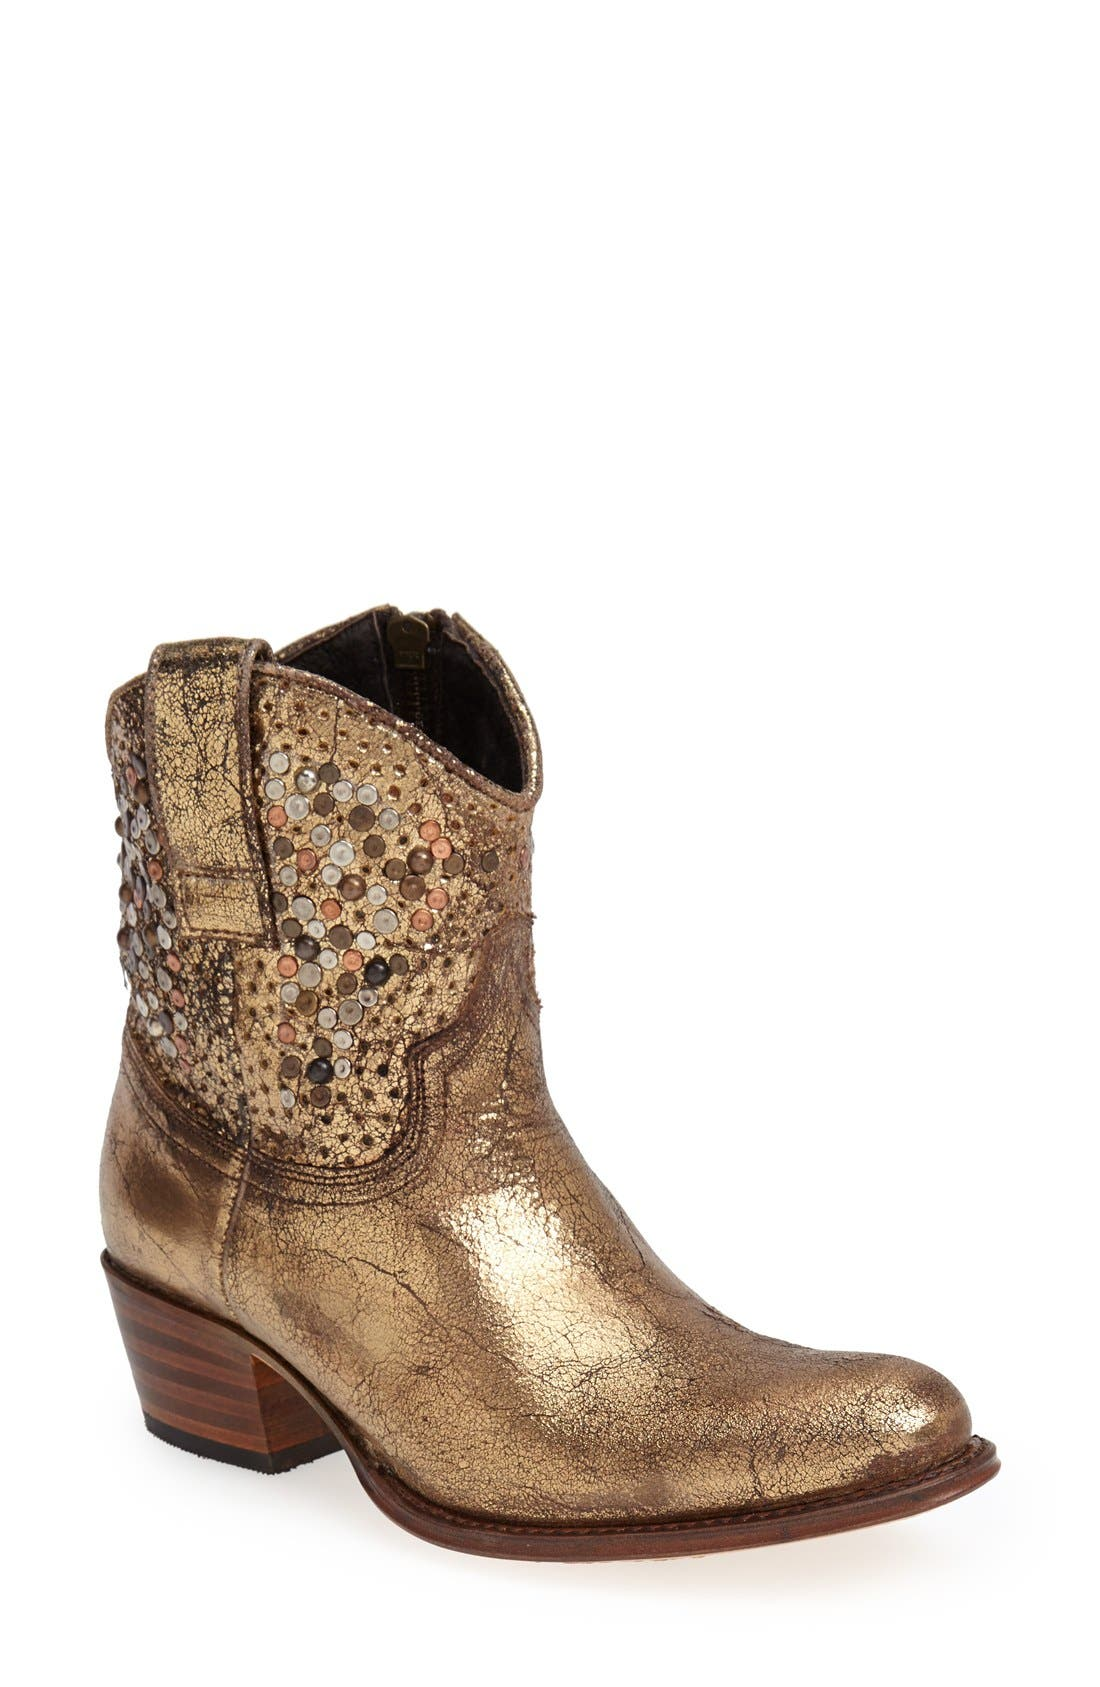 Alternate Image 1 Selected - Frye 'Deborah' Studded Ankle Boot